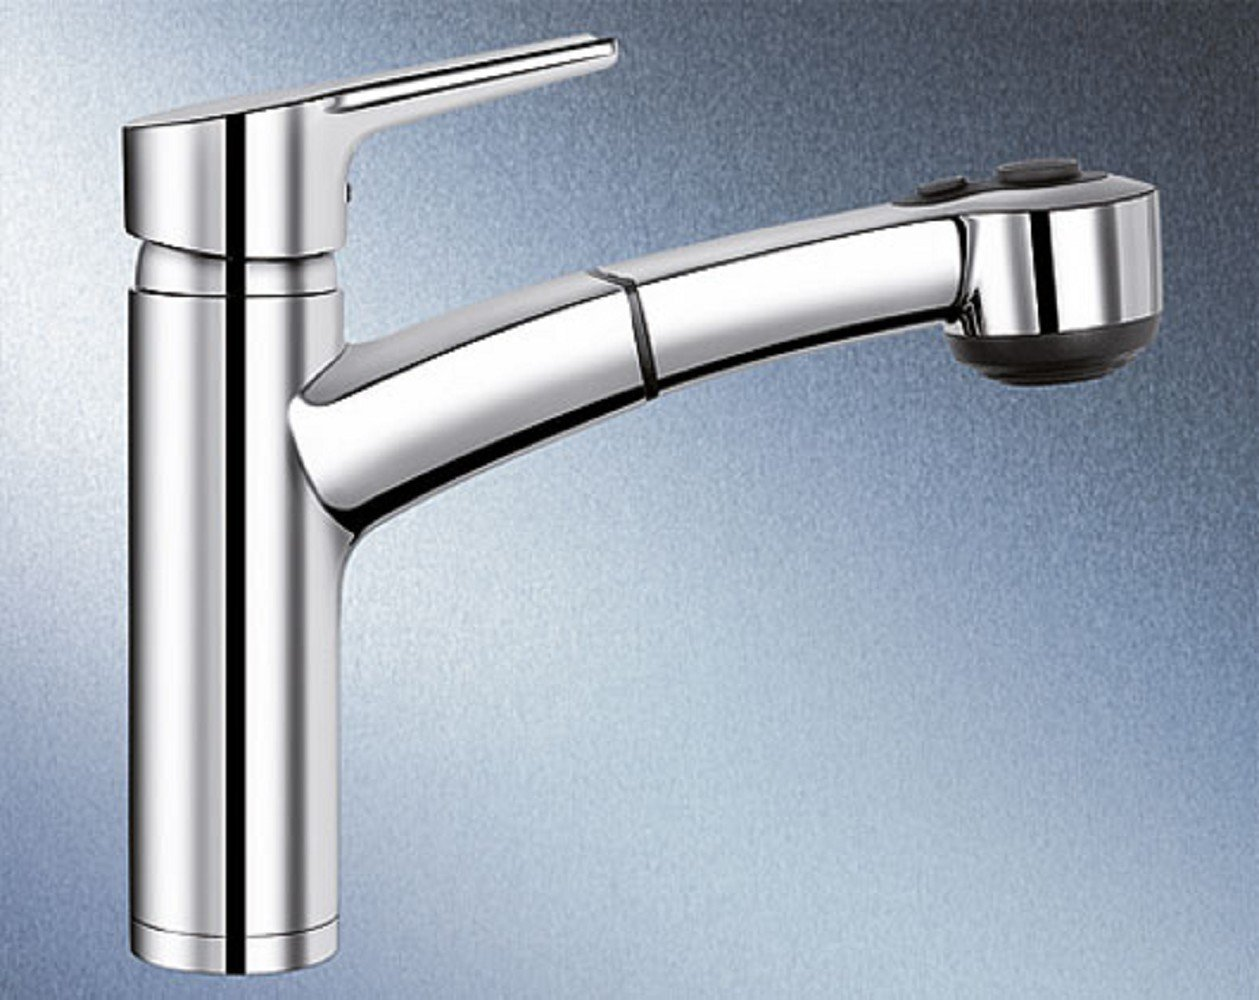 Blanco Merkur-S Küchenarmatur, chrom, 513711: Amazon.de: Baumarkt